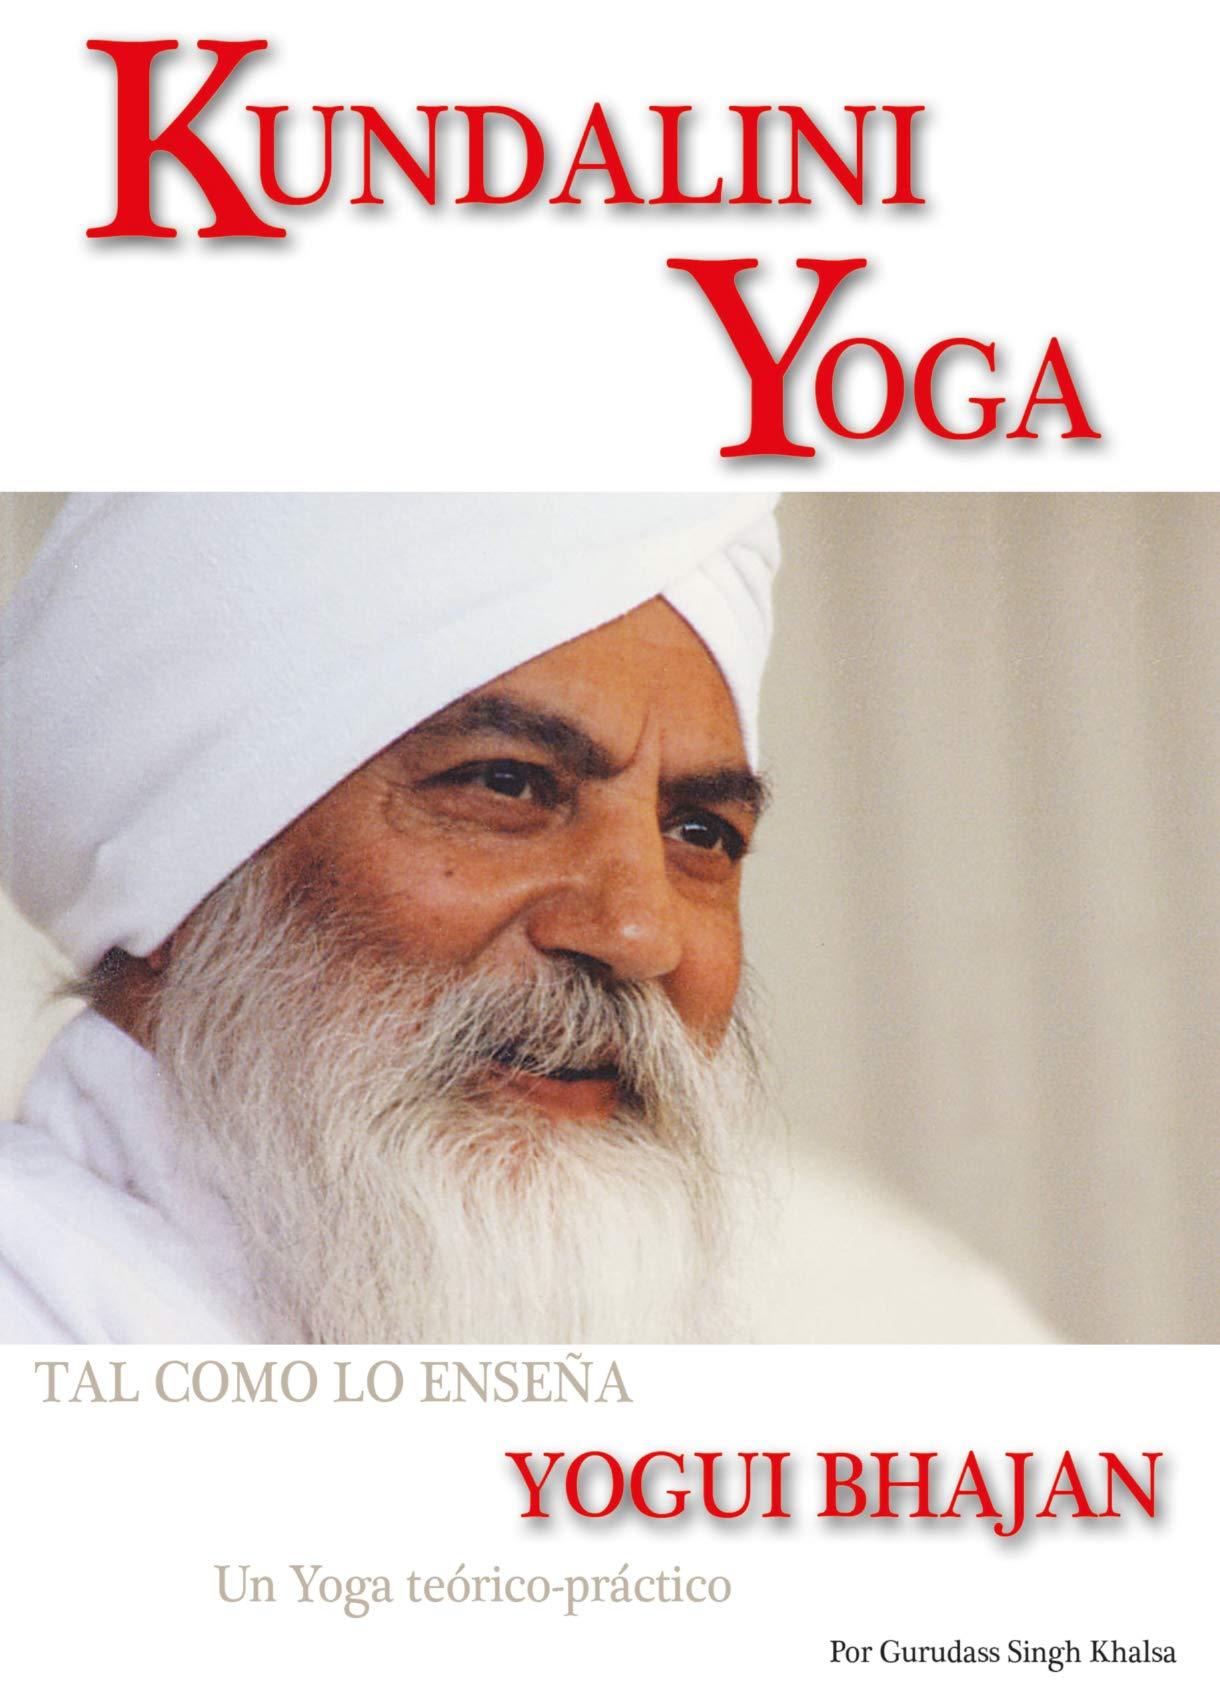 Kundalini yoga: Gurudass Singh: 9788420301495: Amazon.com: Books